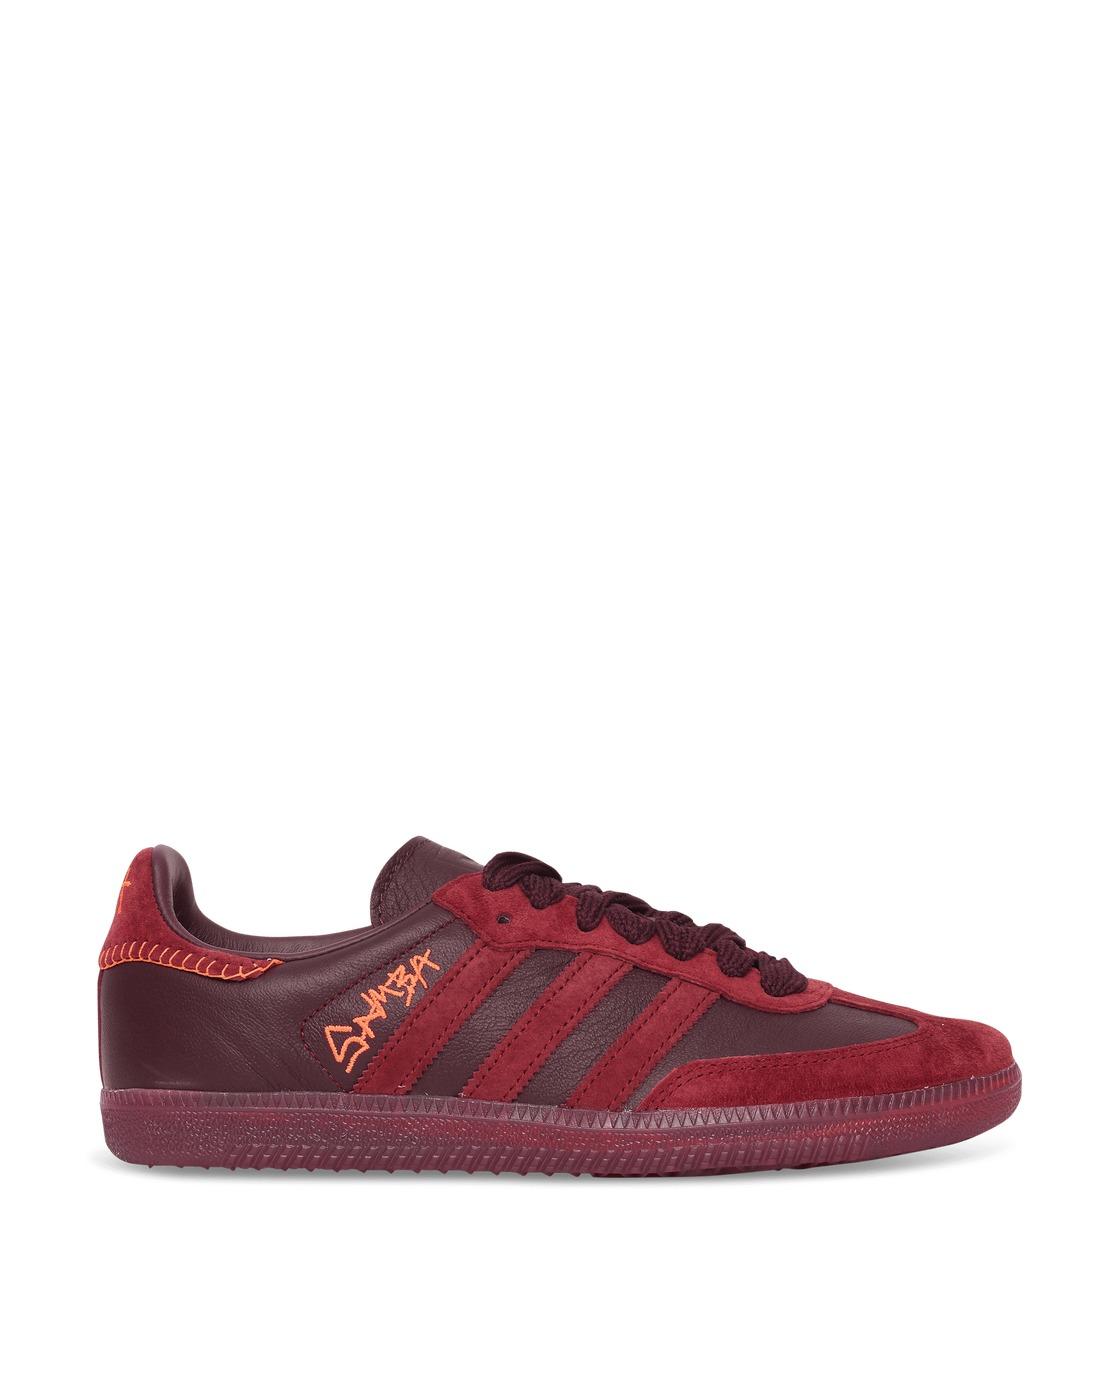 Adidas Originals Jonah Hill Samba Sneakers Maroon/Ecru